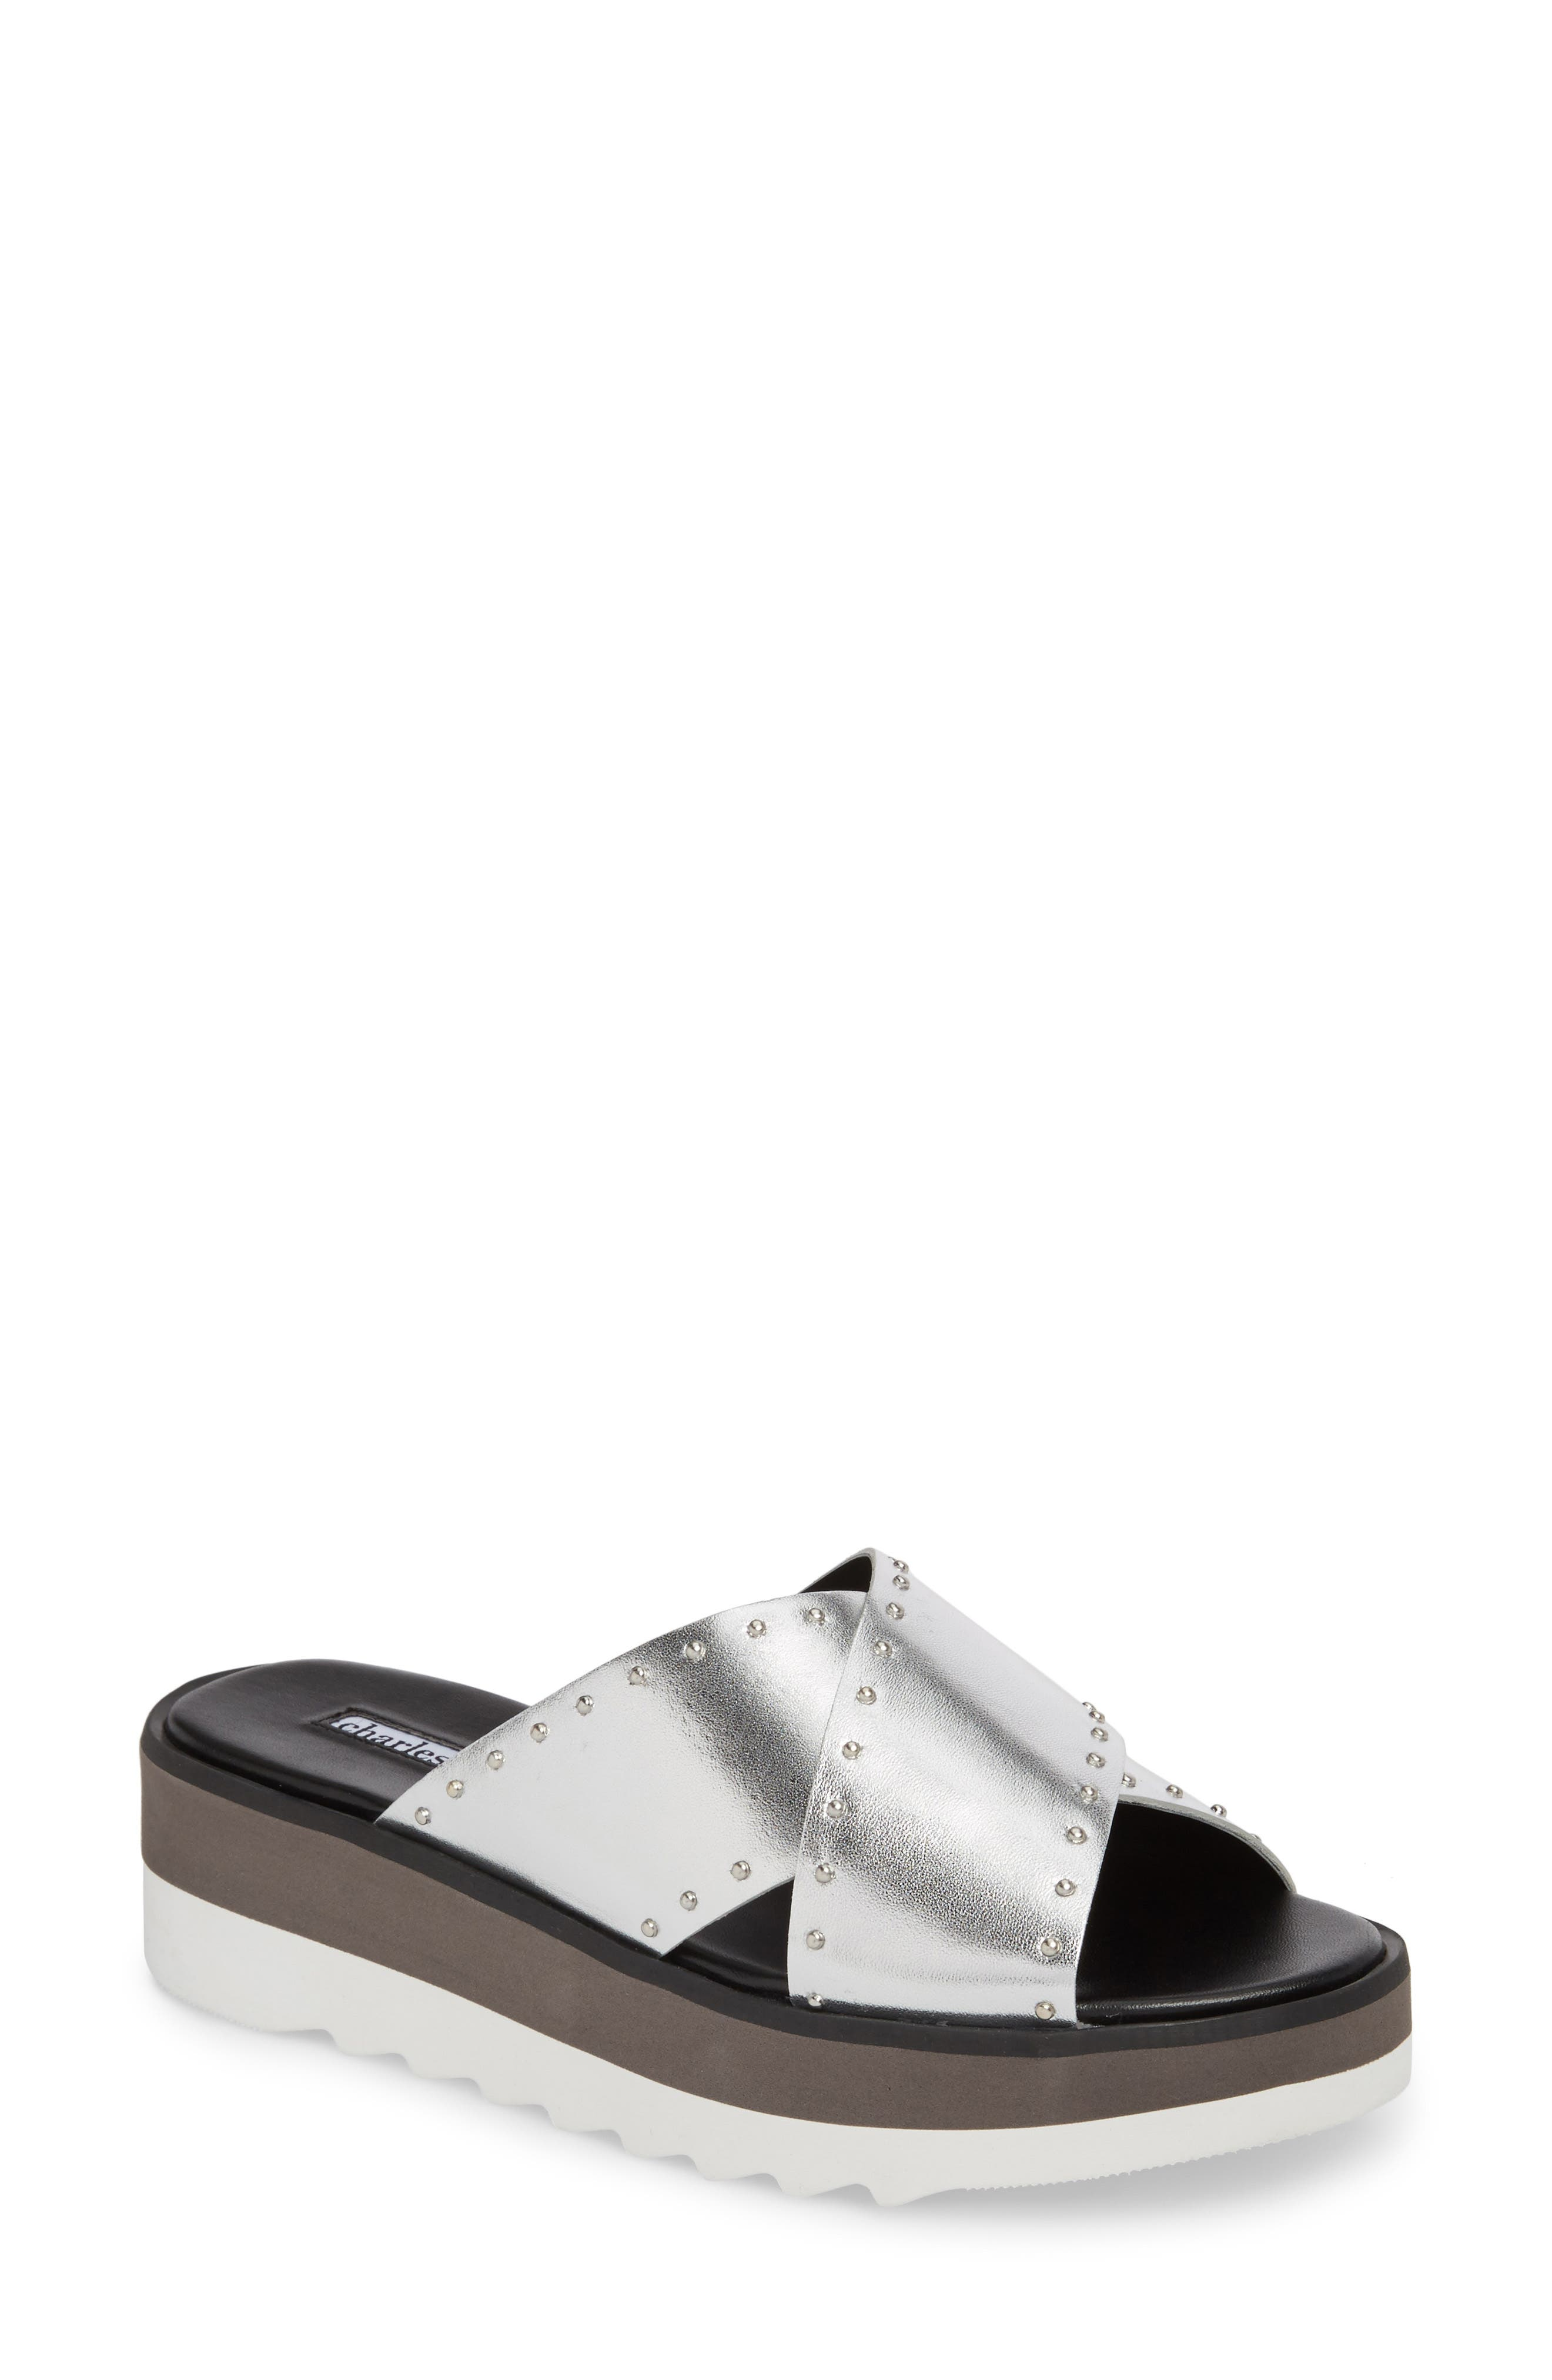 Charles David Buxom Sandal- Metallic